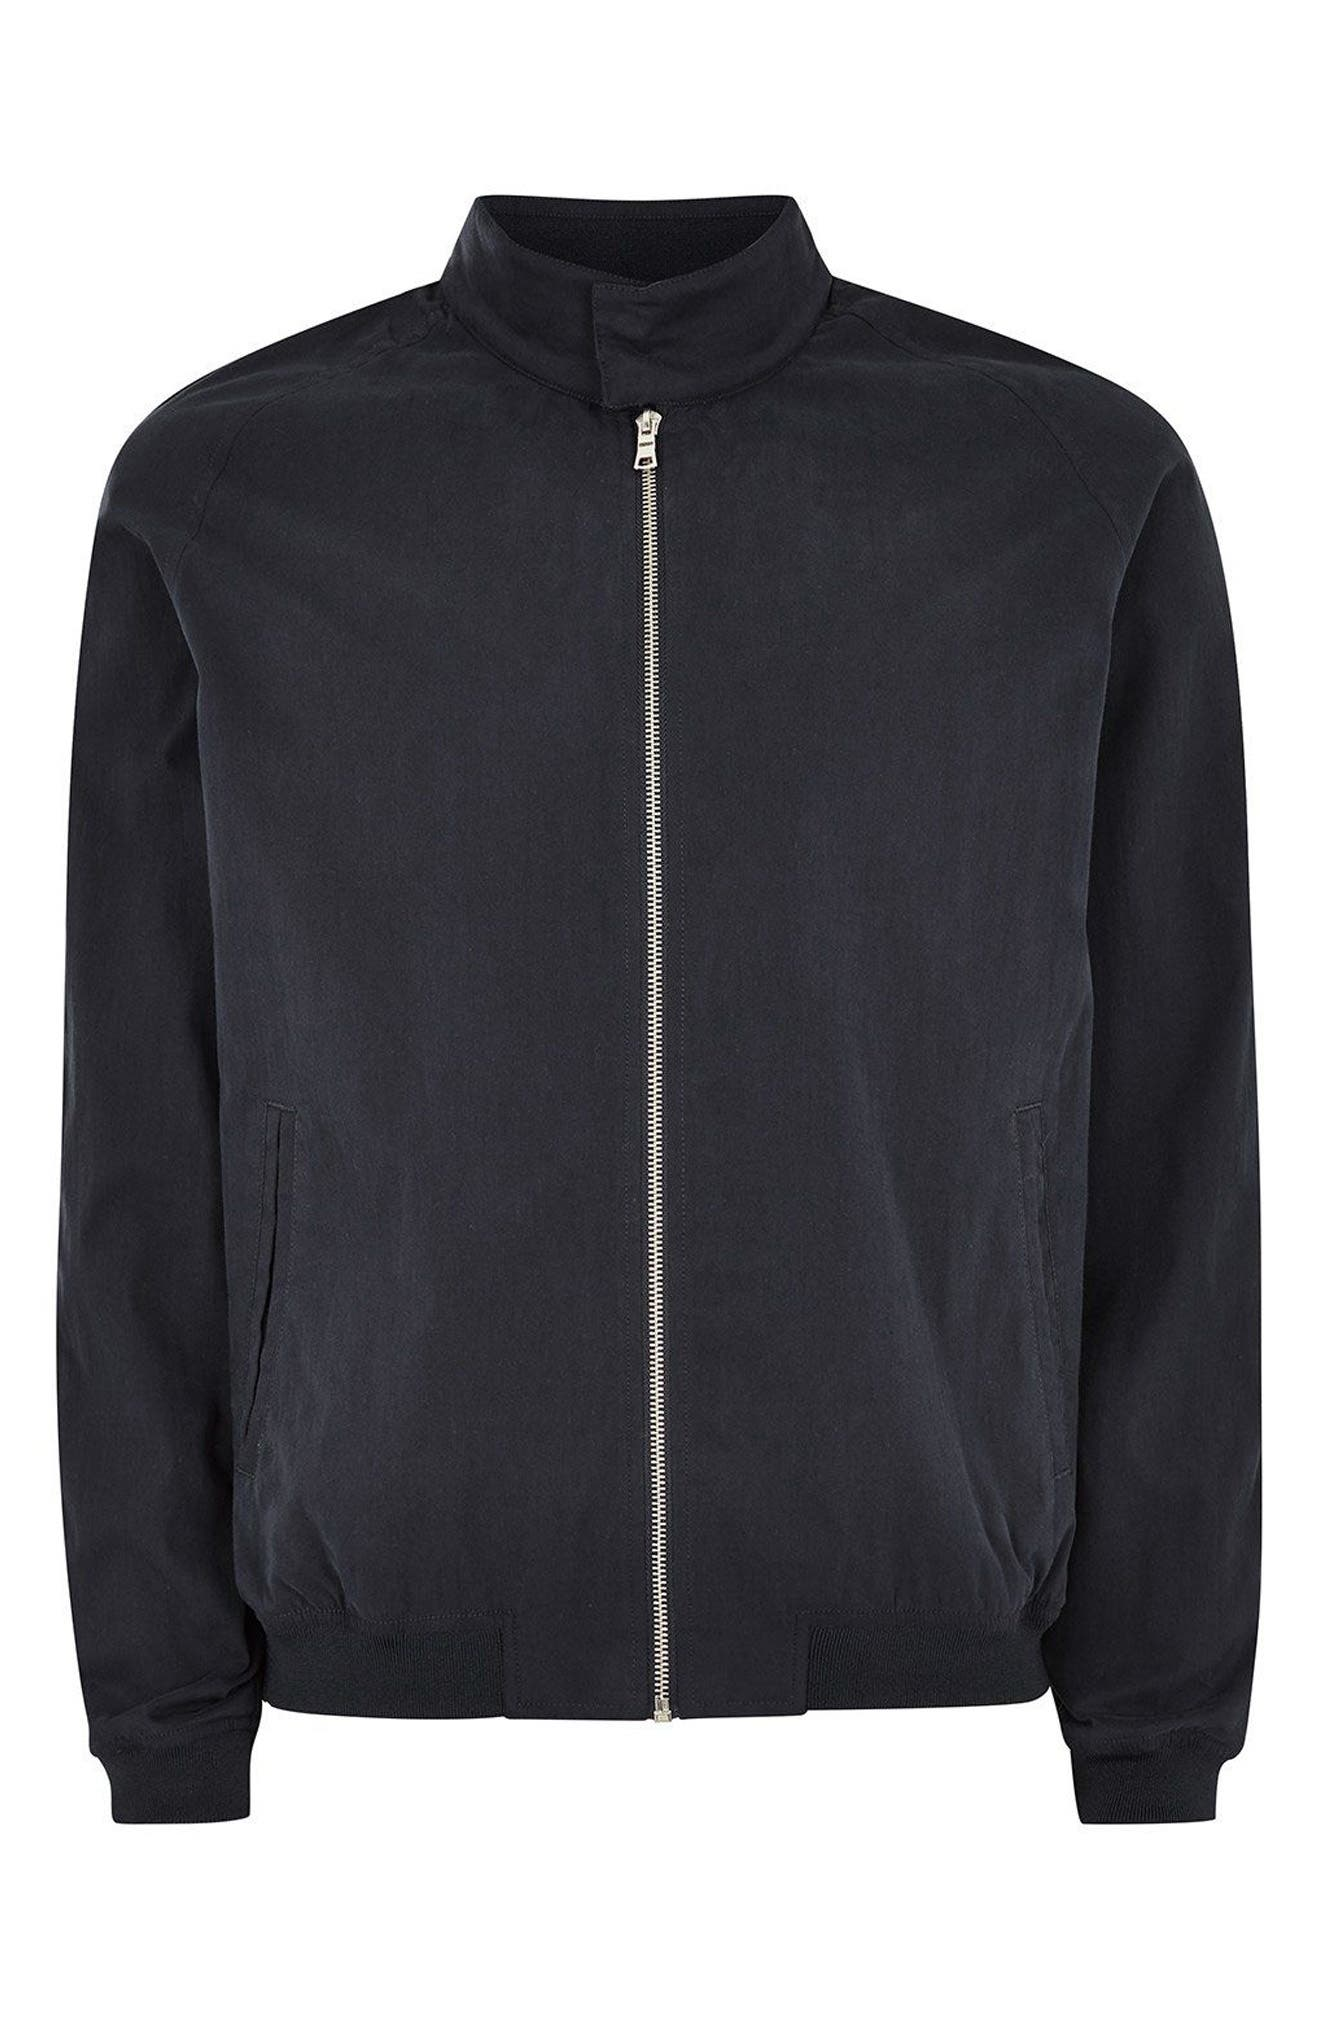 Harrington Jacket,                             Alternate thumbnail 4, color,                             DARK BLUE